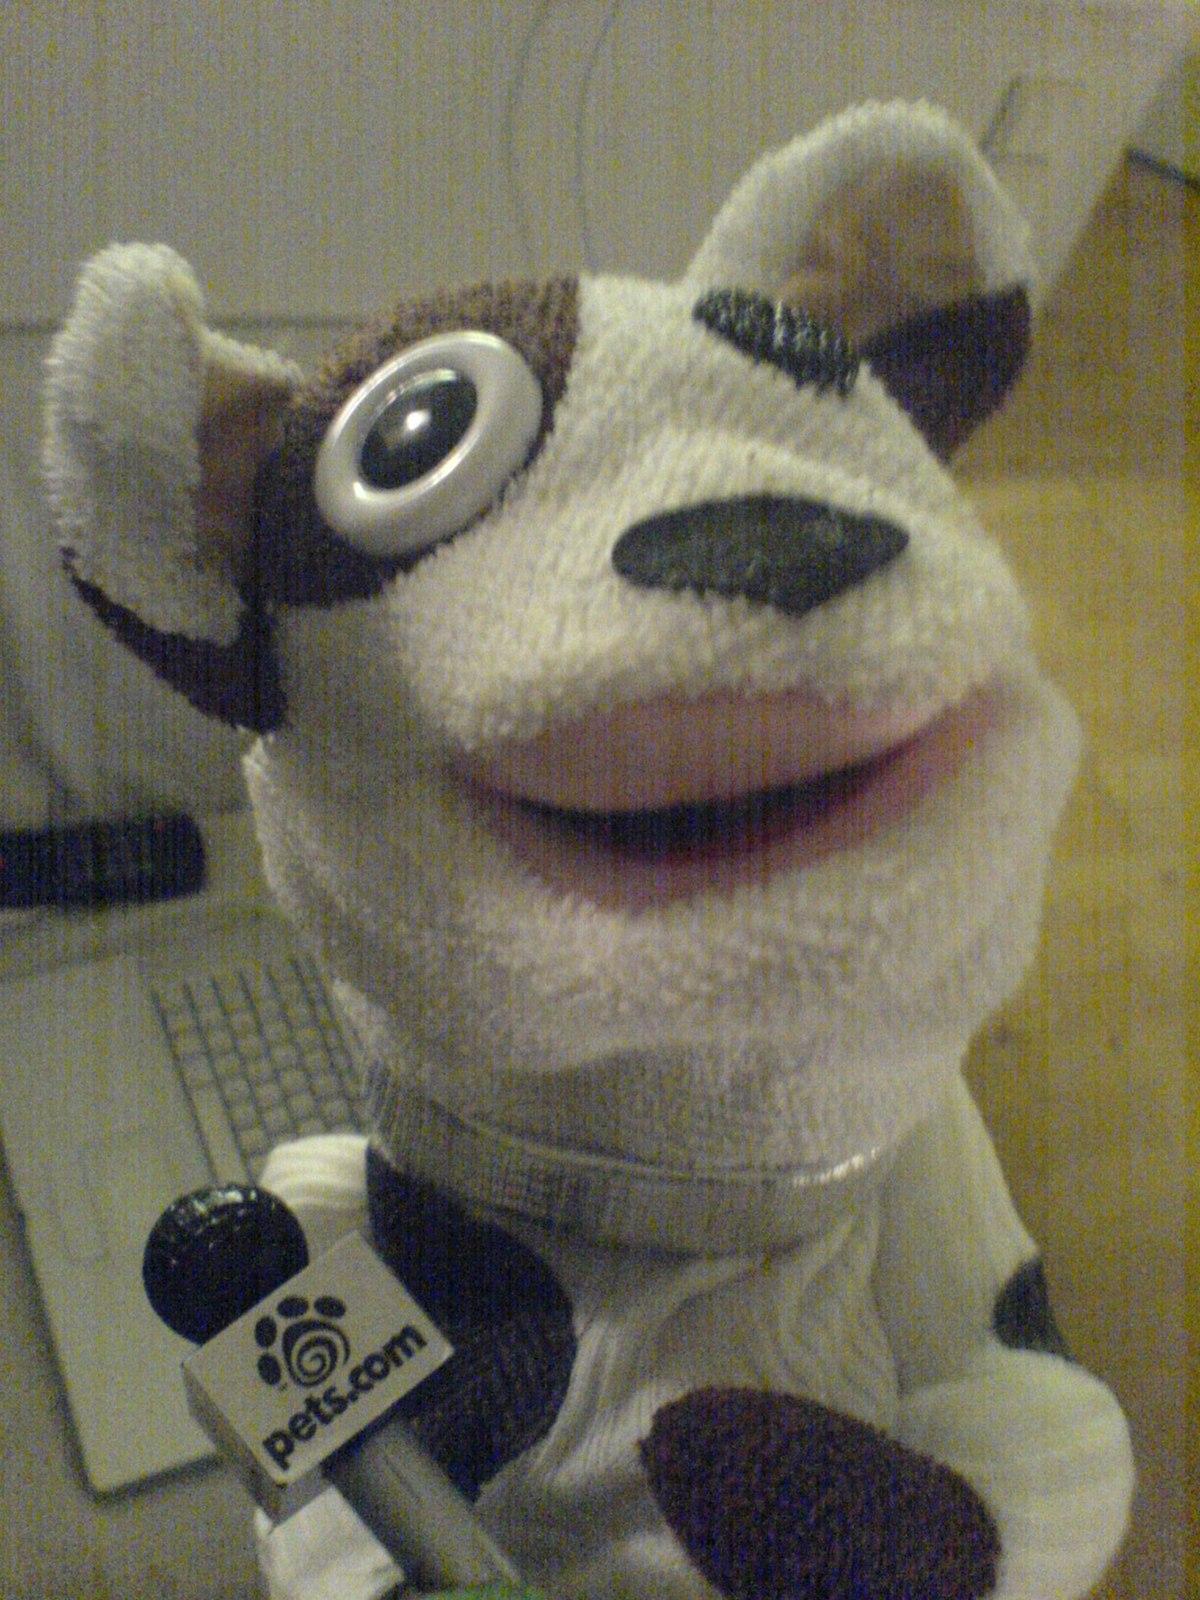 Pets.com - Wikipedia